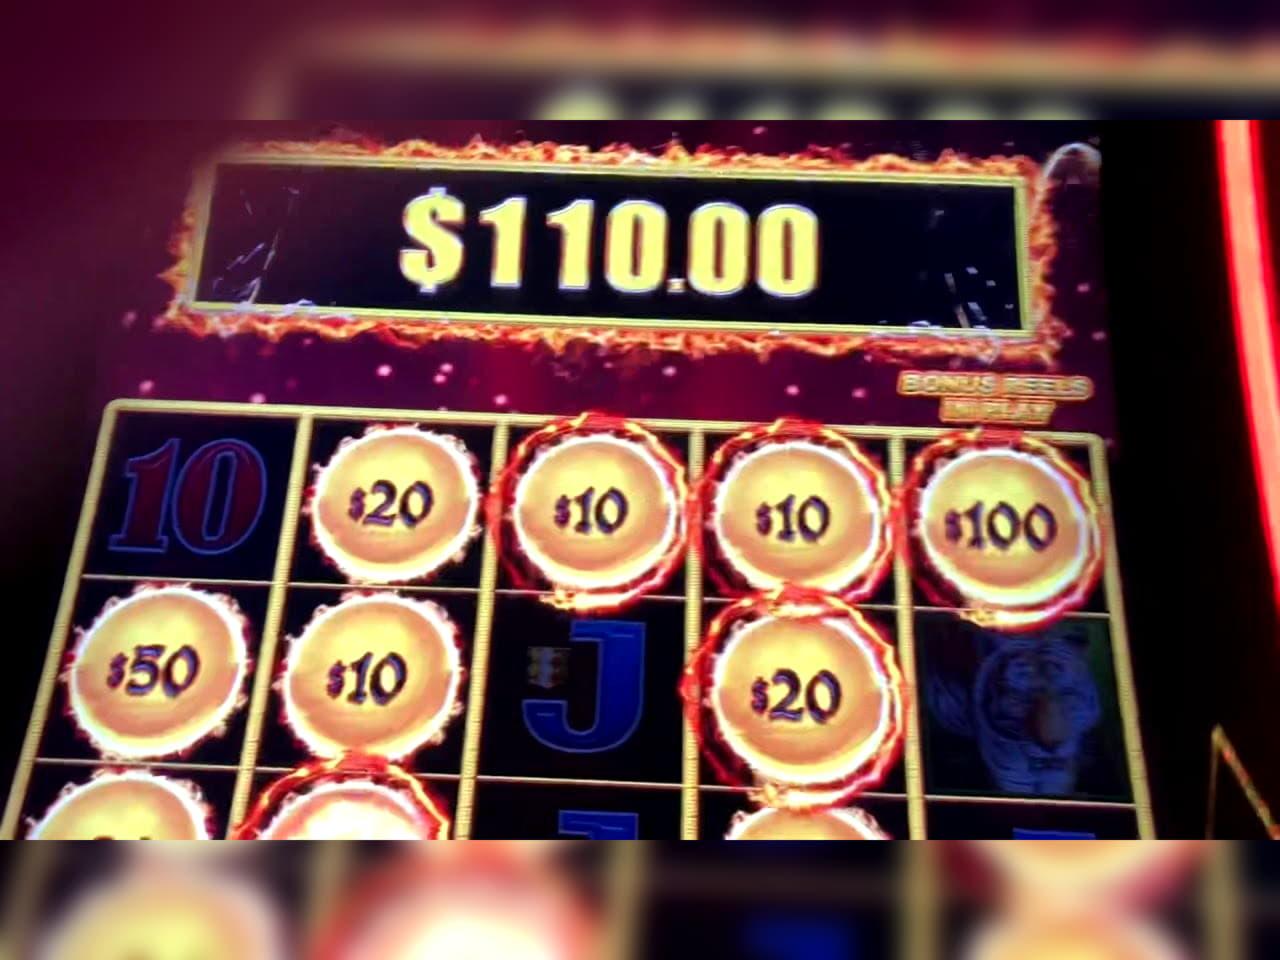 130 Free Spins Casino at Challenge Casino